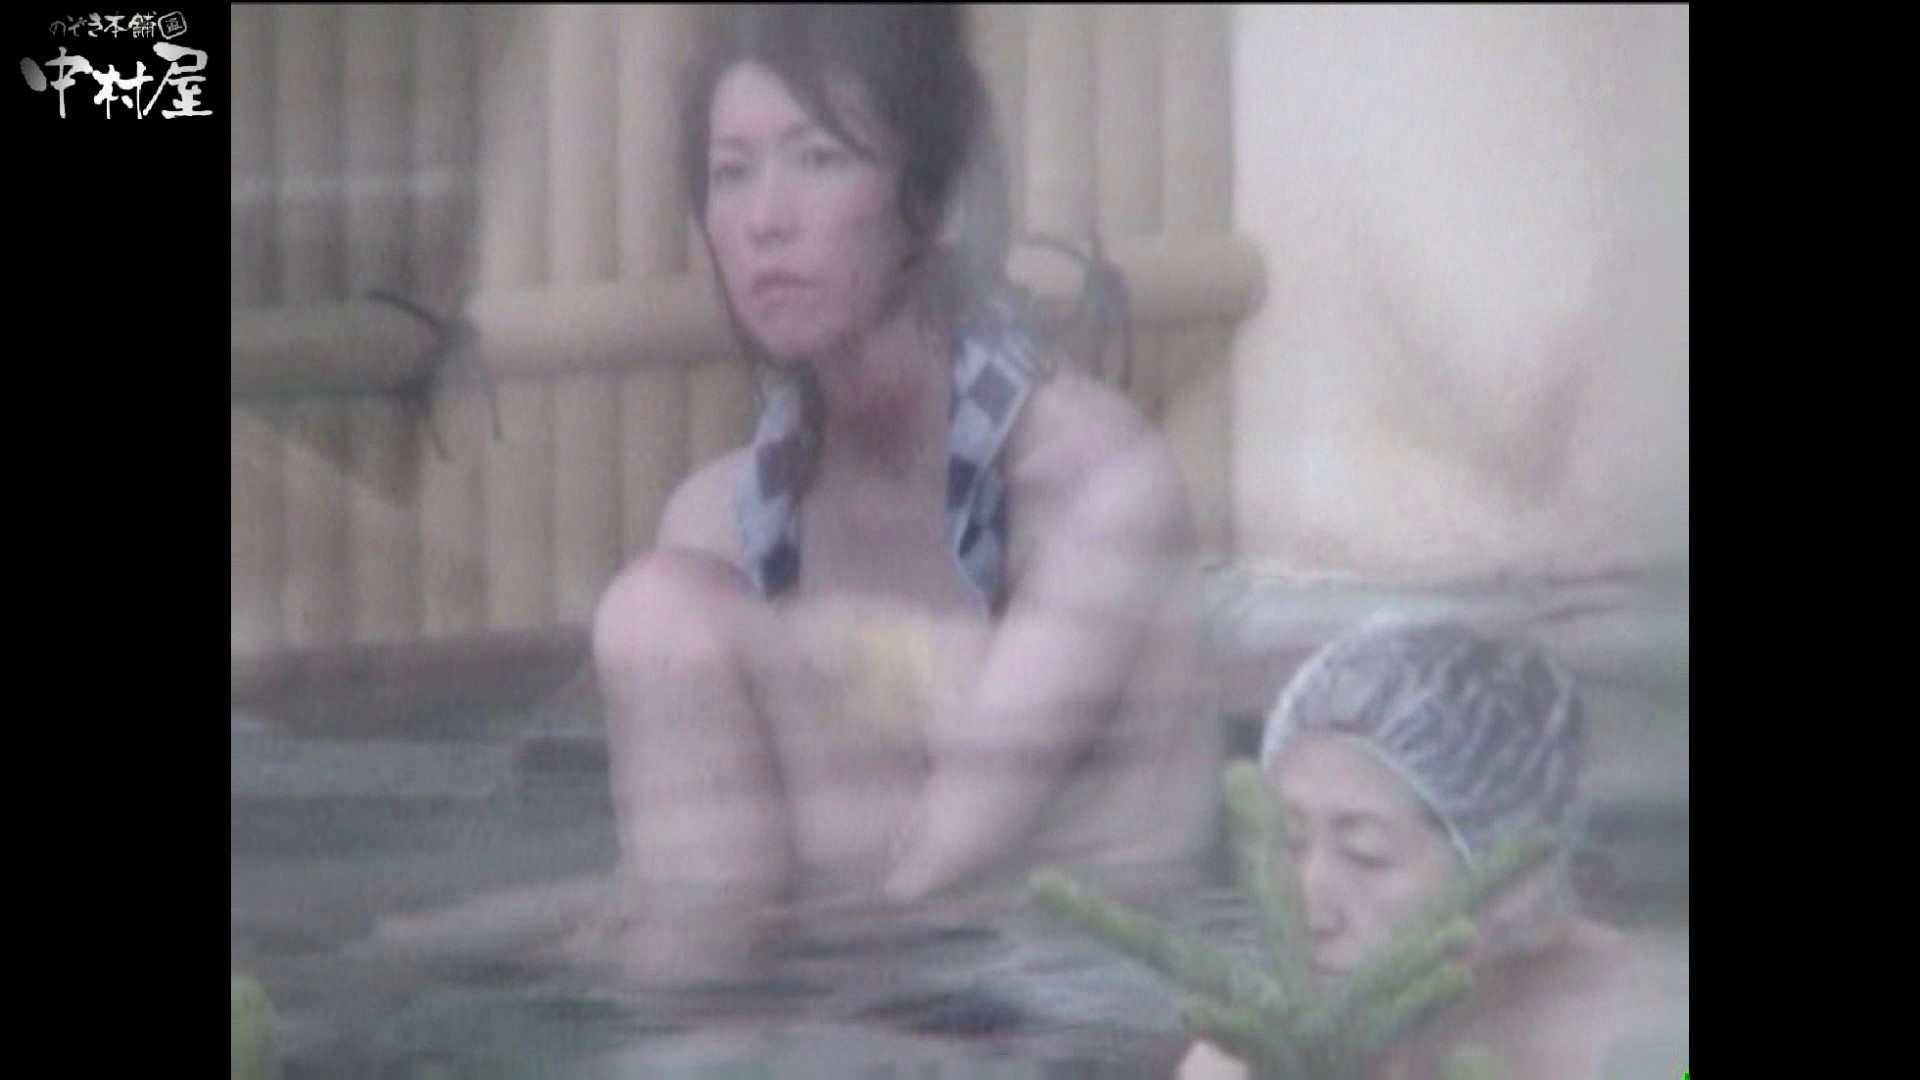 Aquaな露天風呂Vol.987 盗撮シリーズ | 露天風呂編  88PIX 41